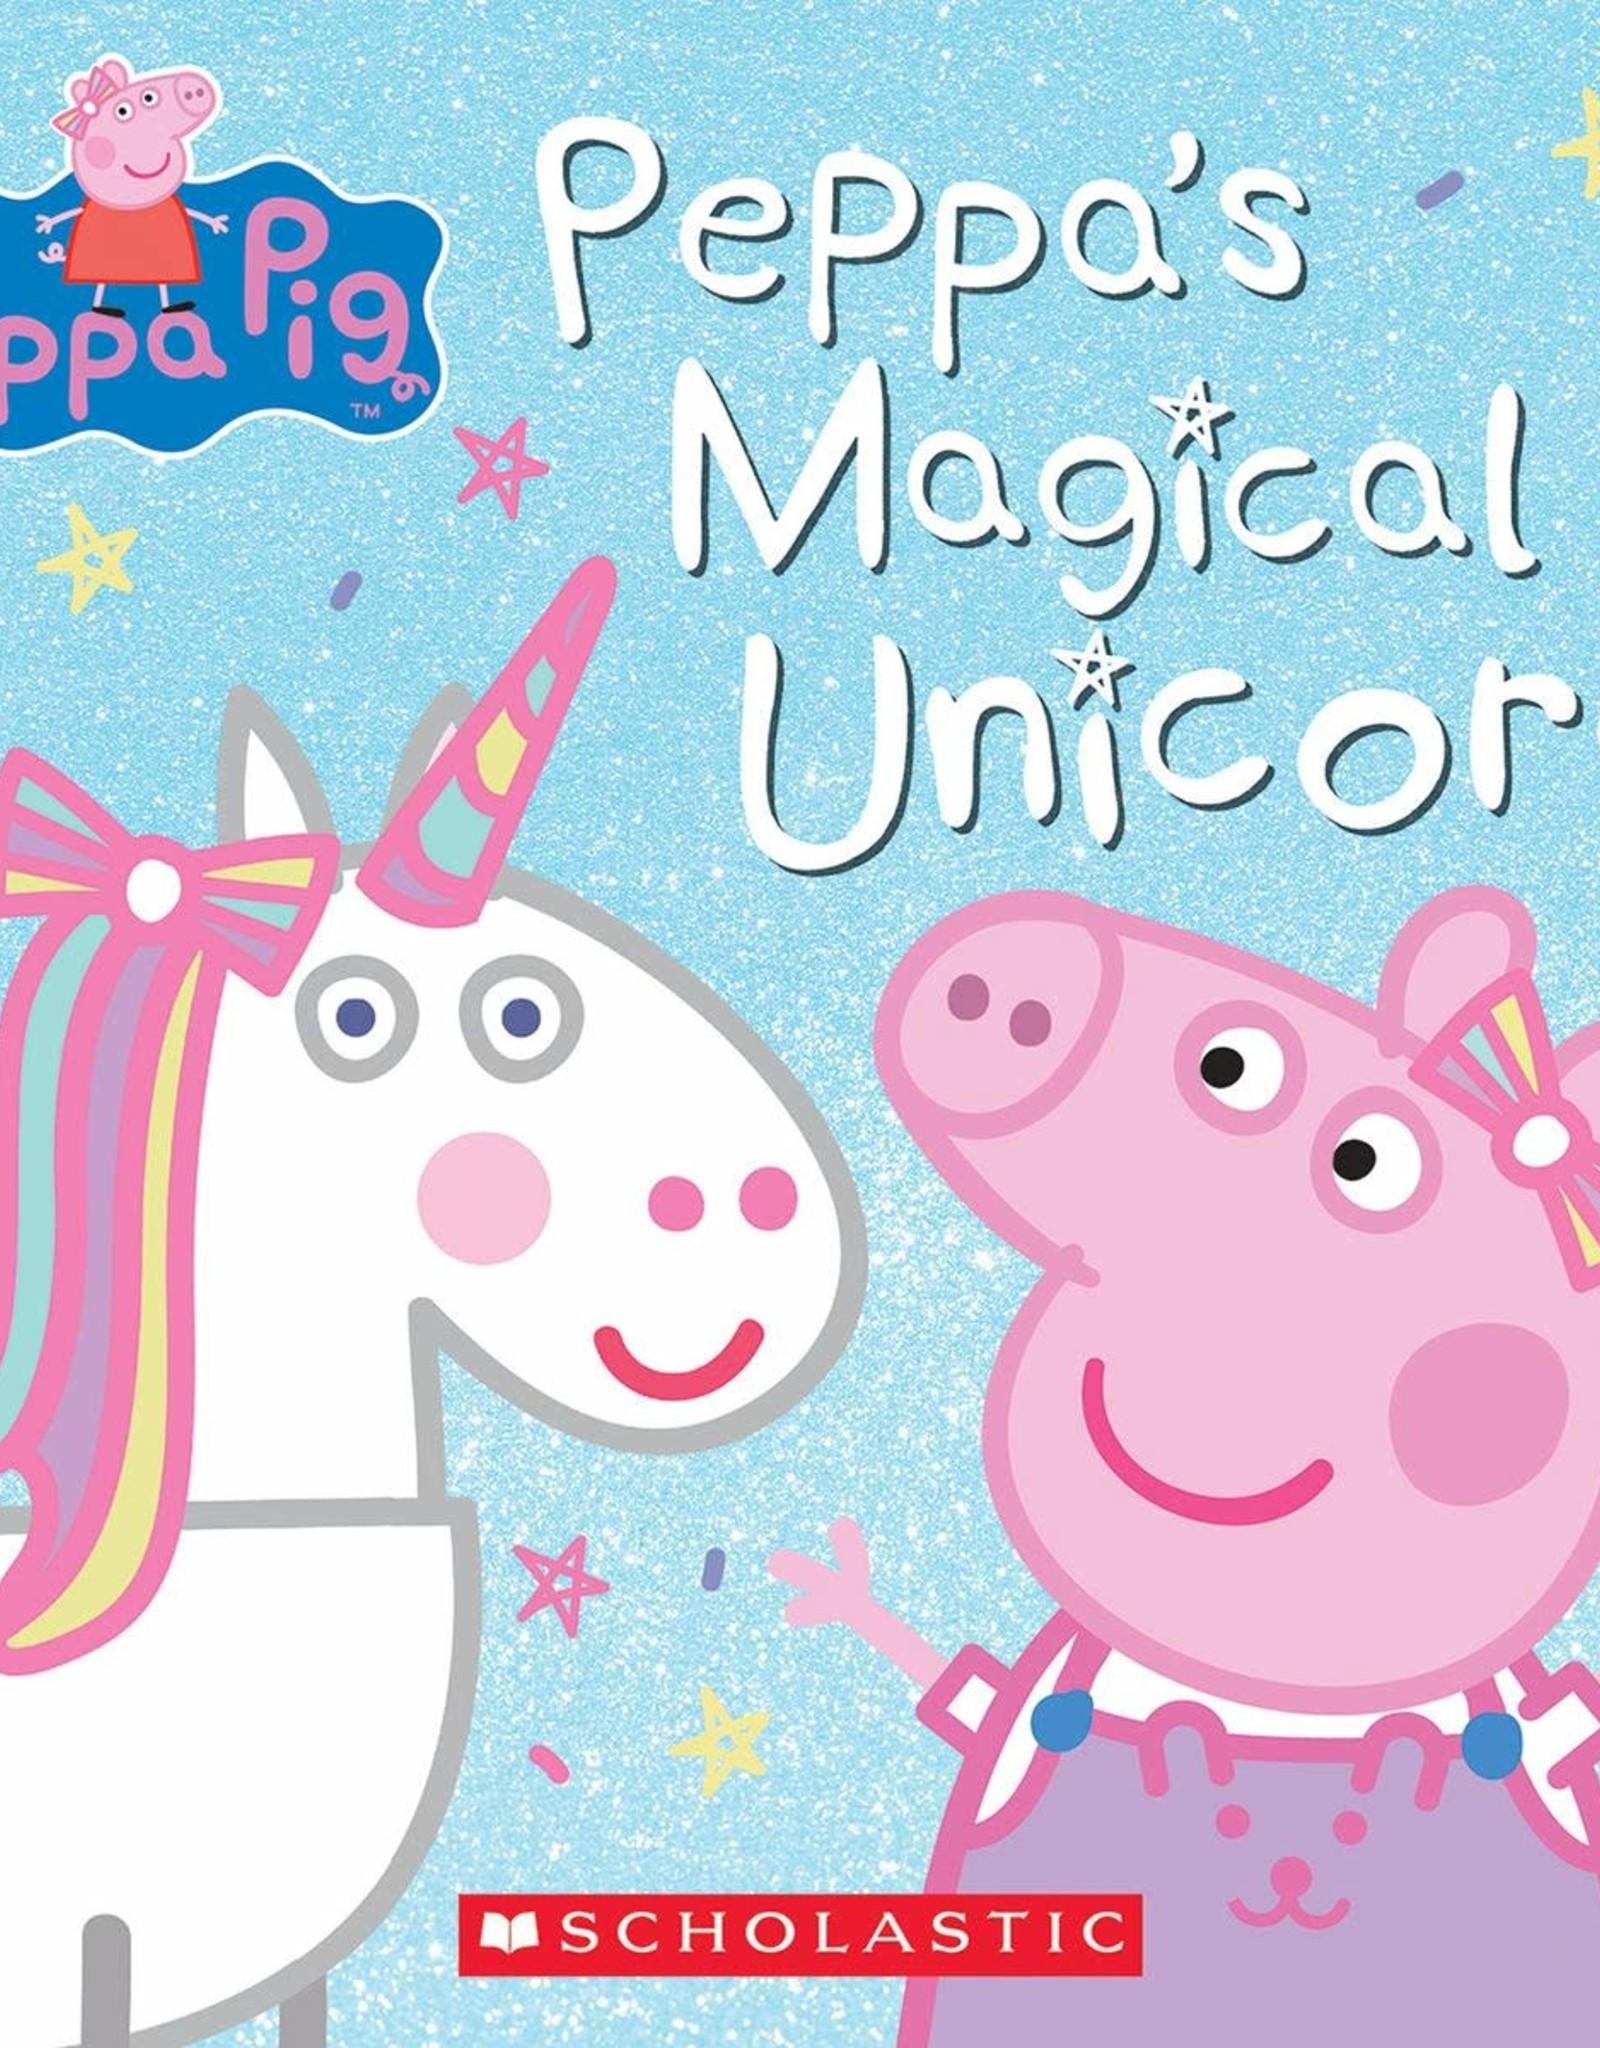 Scholastic Peppa's Magical Unicorn